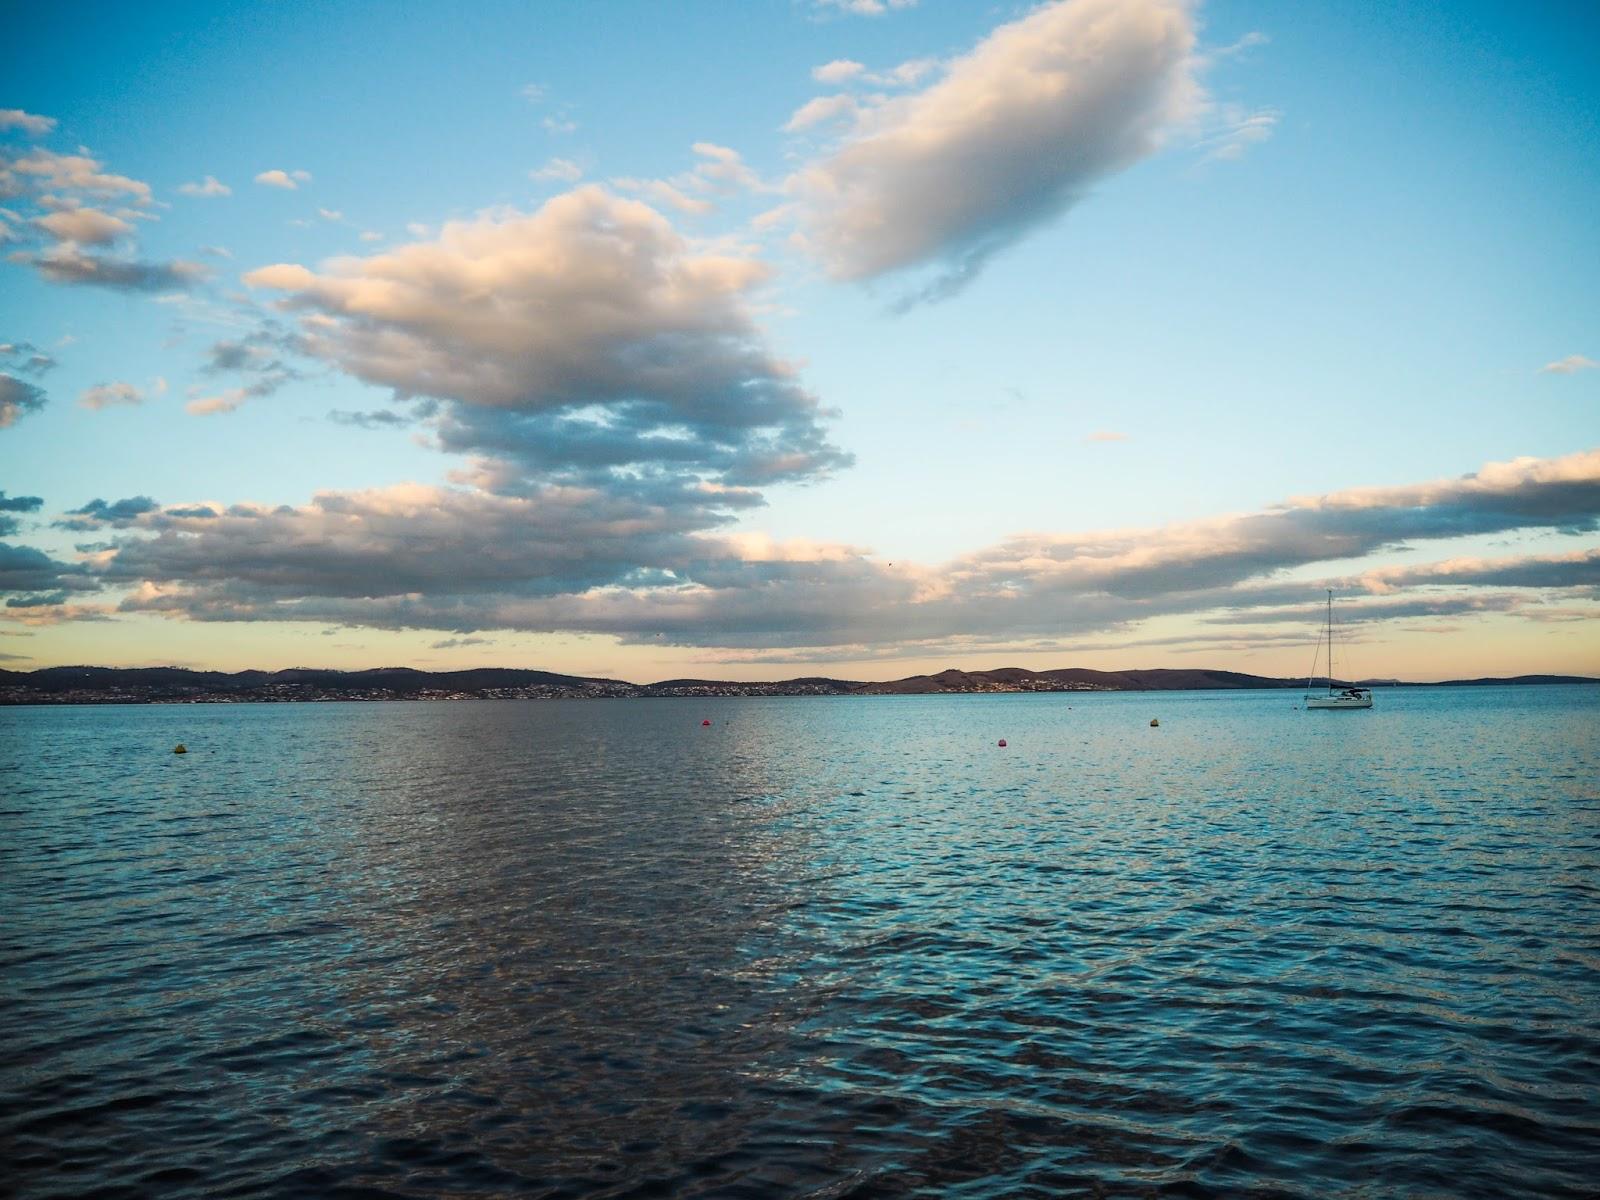 Hobart harbourside, Tasmania